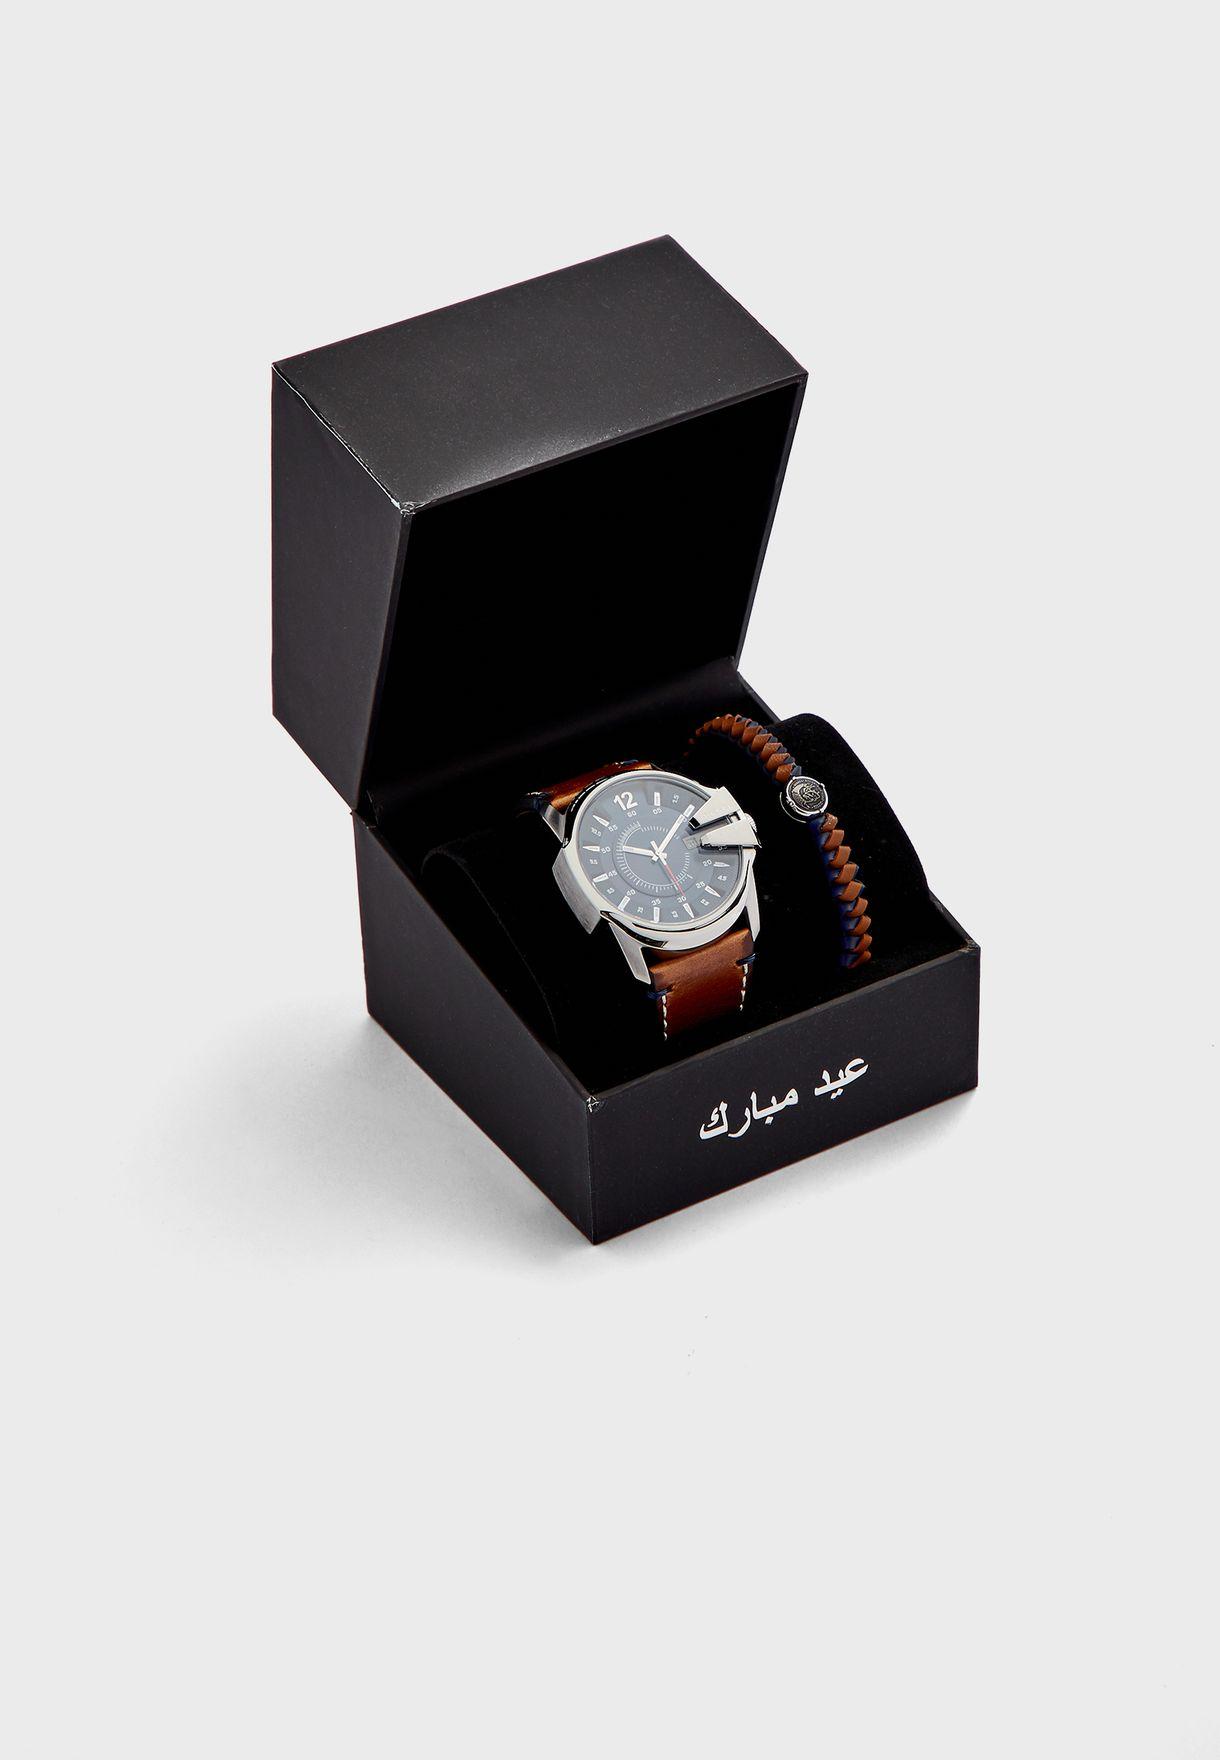 DZ1925 Master Chief Analog Watch & Bracelet Gift S